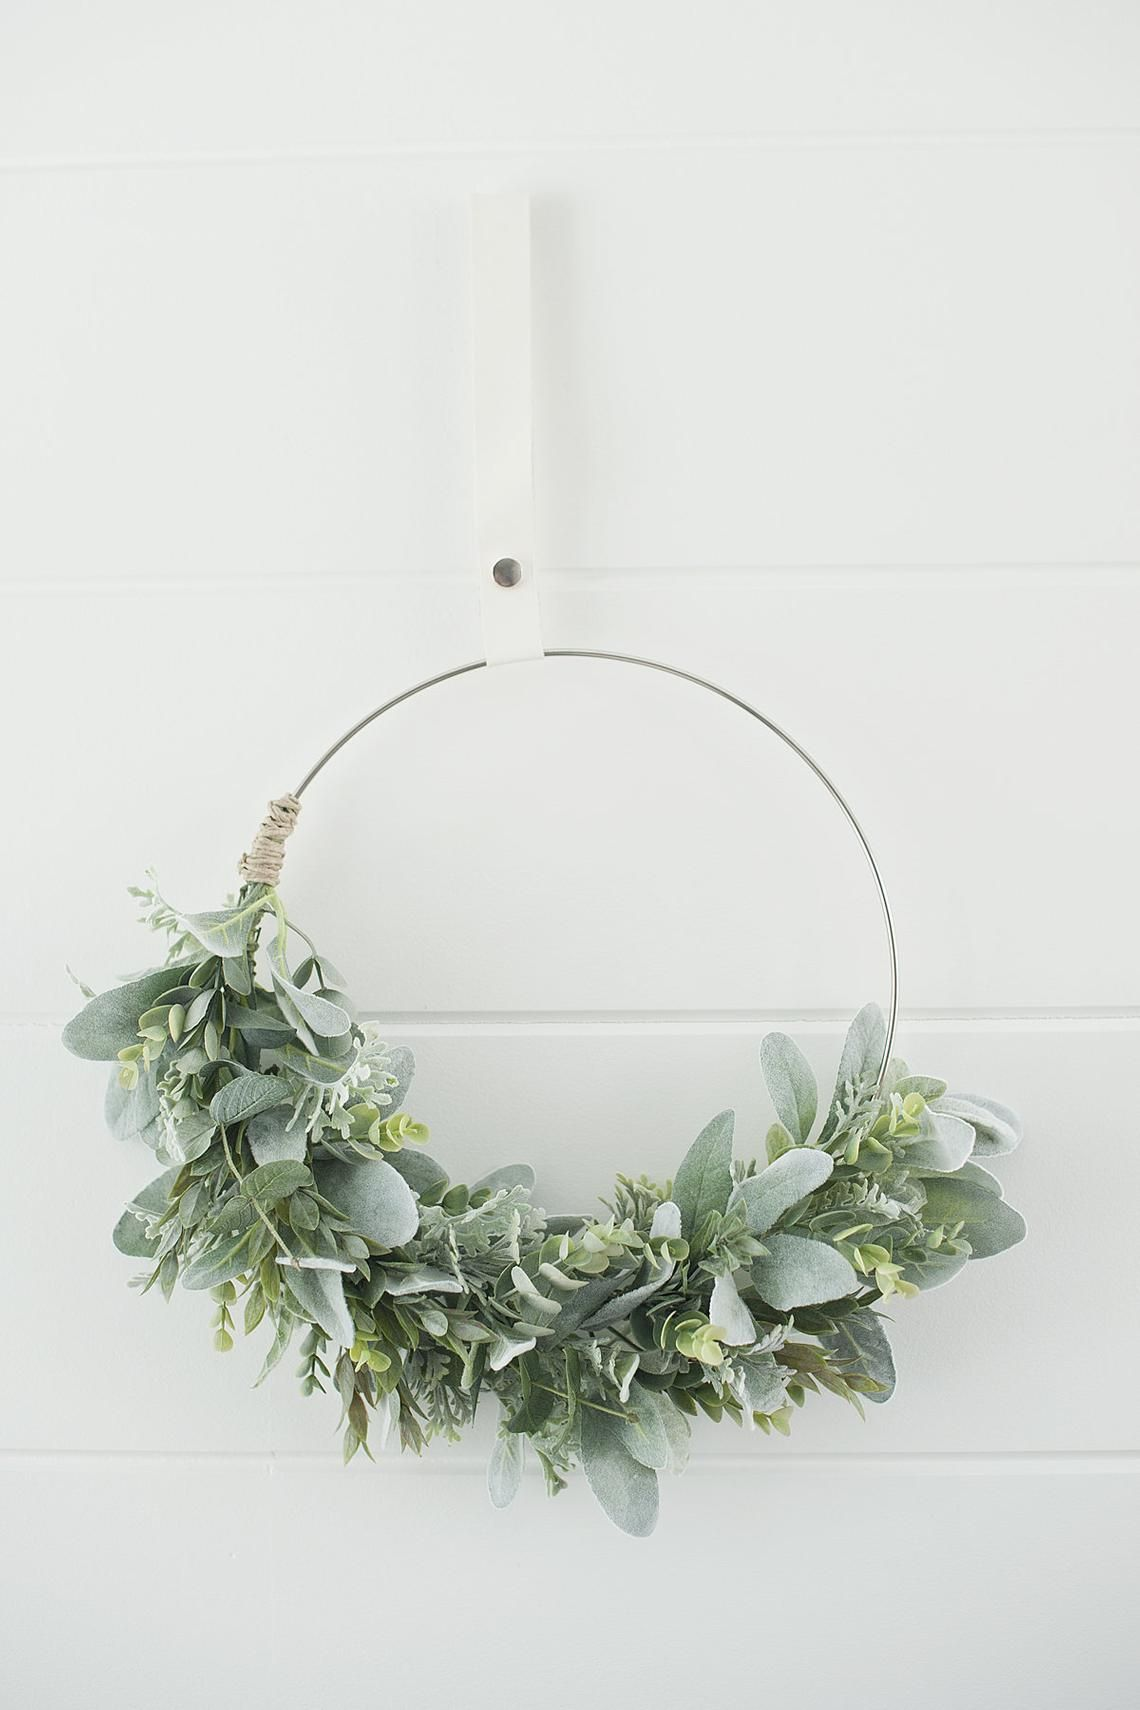 Modern spring soft greens swag wreath||Spring wreath||hoop wreath||Modern wreath||front door wreath|| greens wreath|modern farmhouse